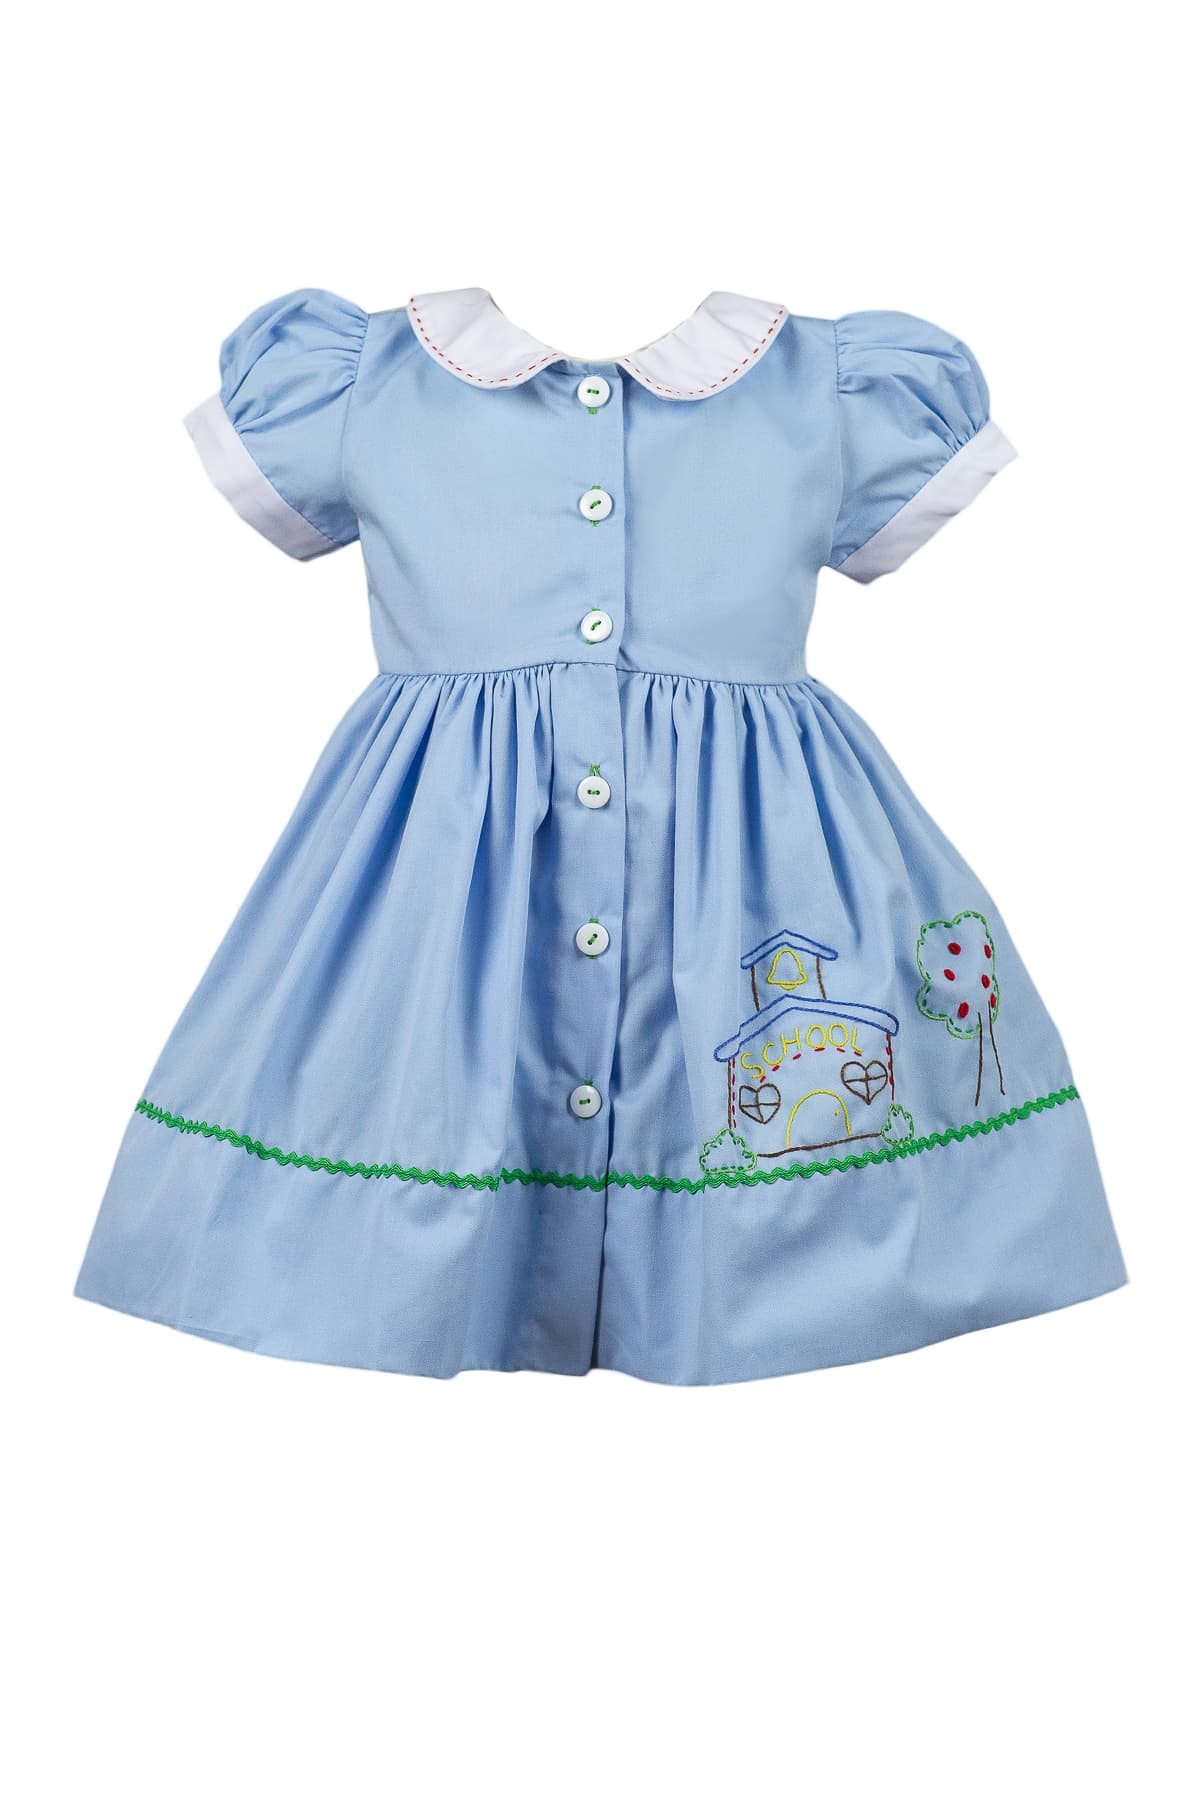 SCHOOL HOUSE DRESS